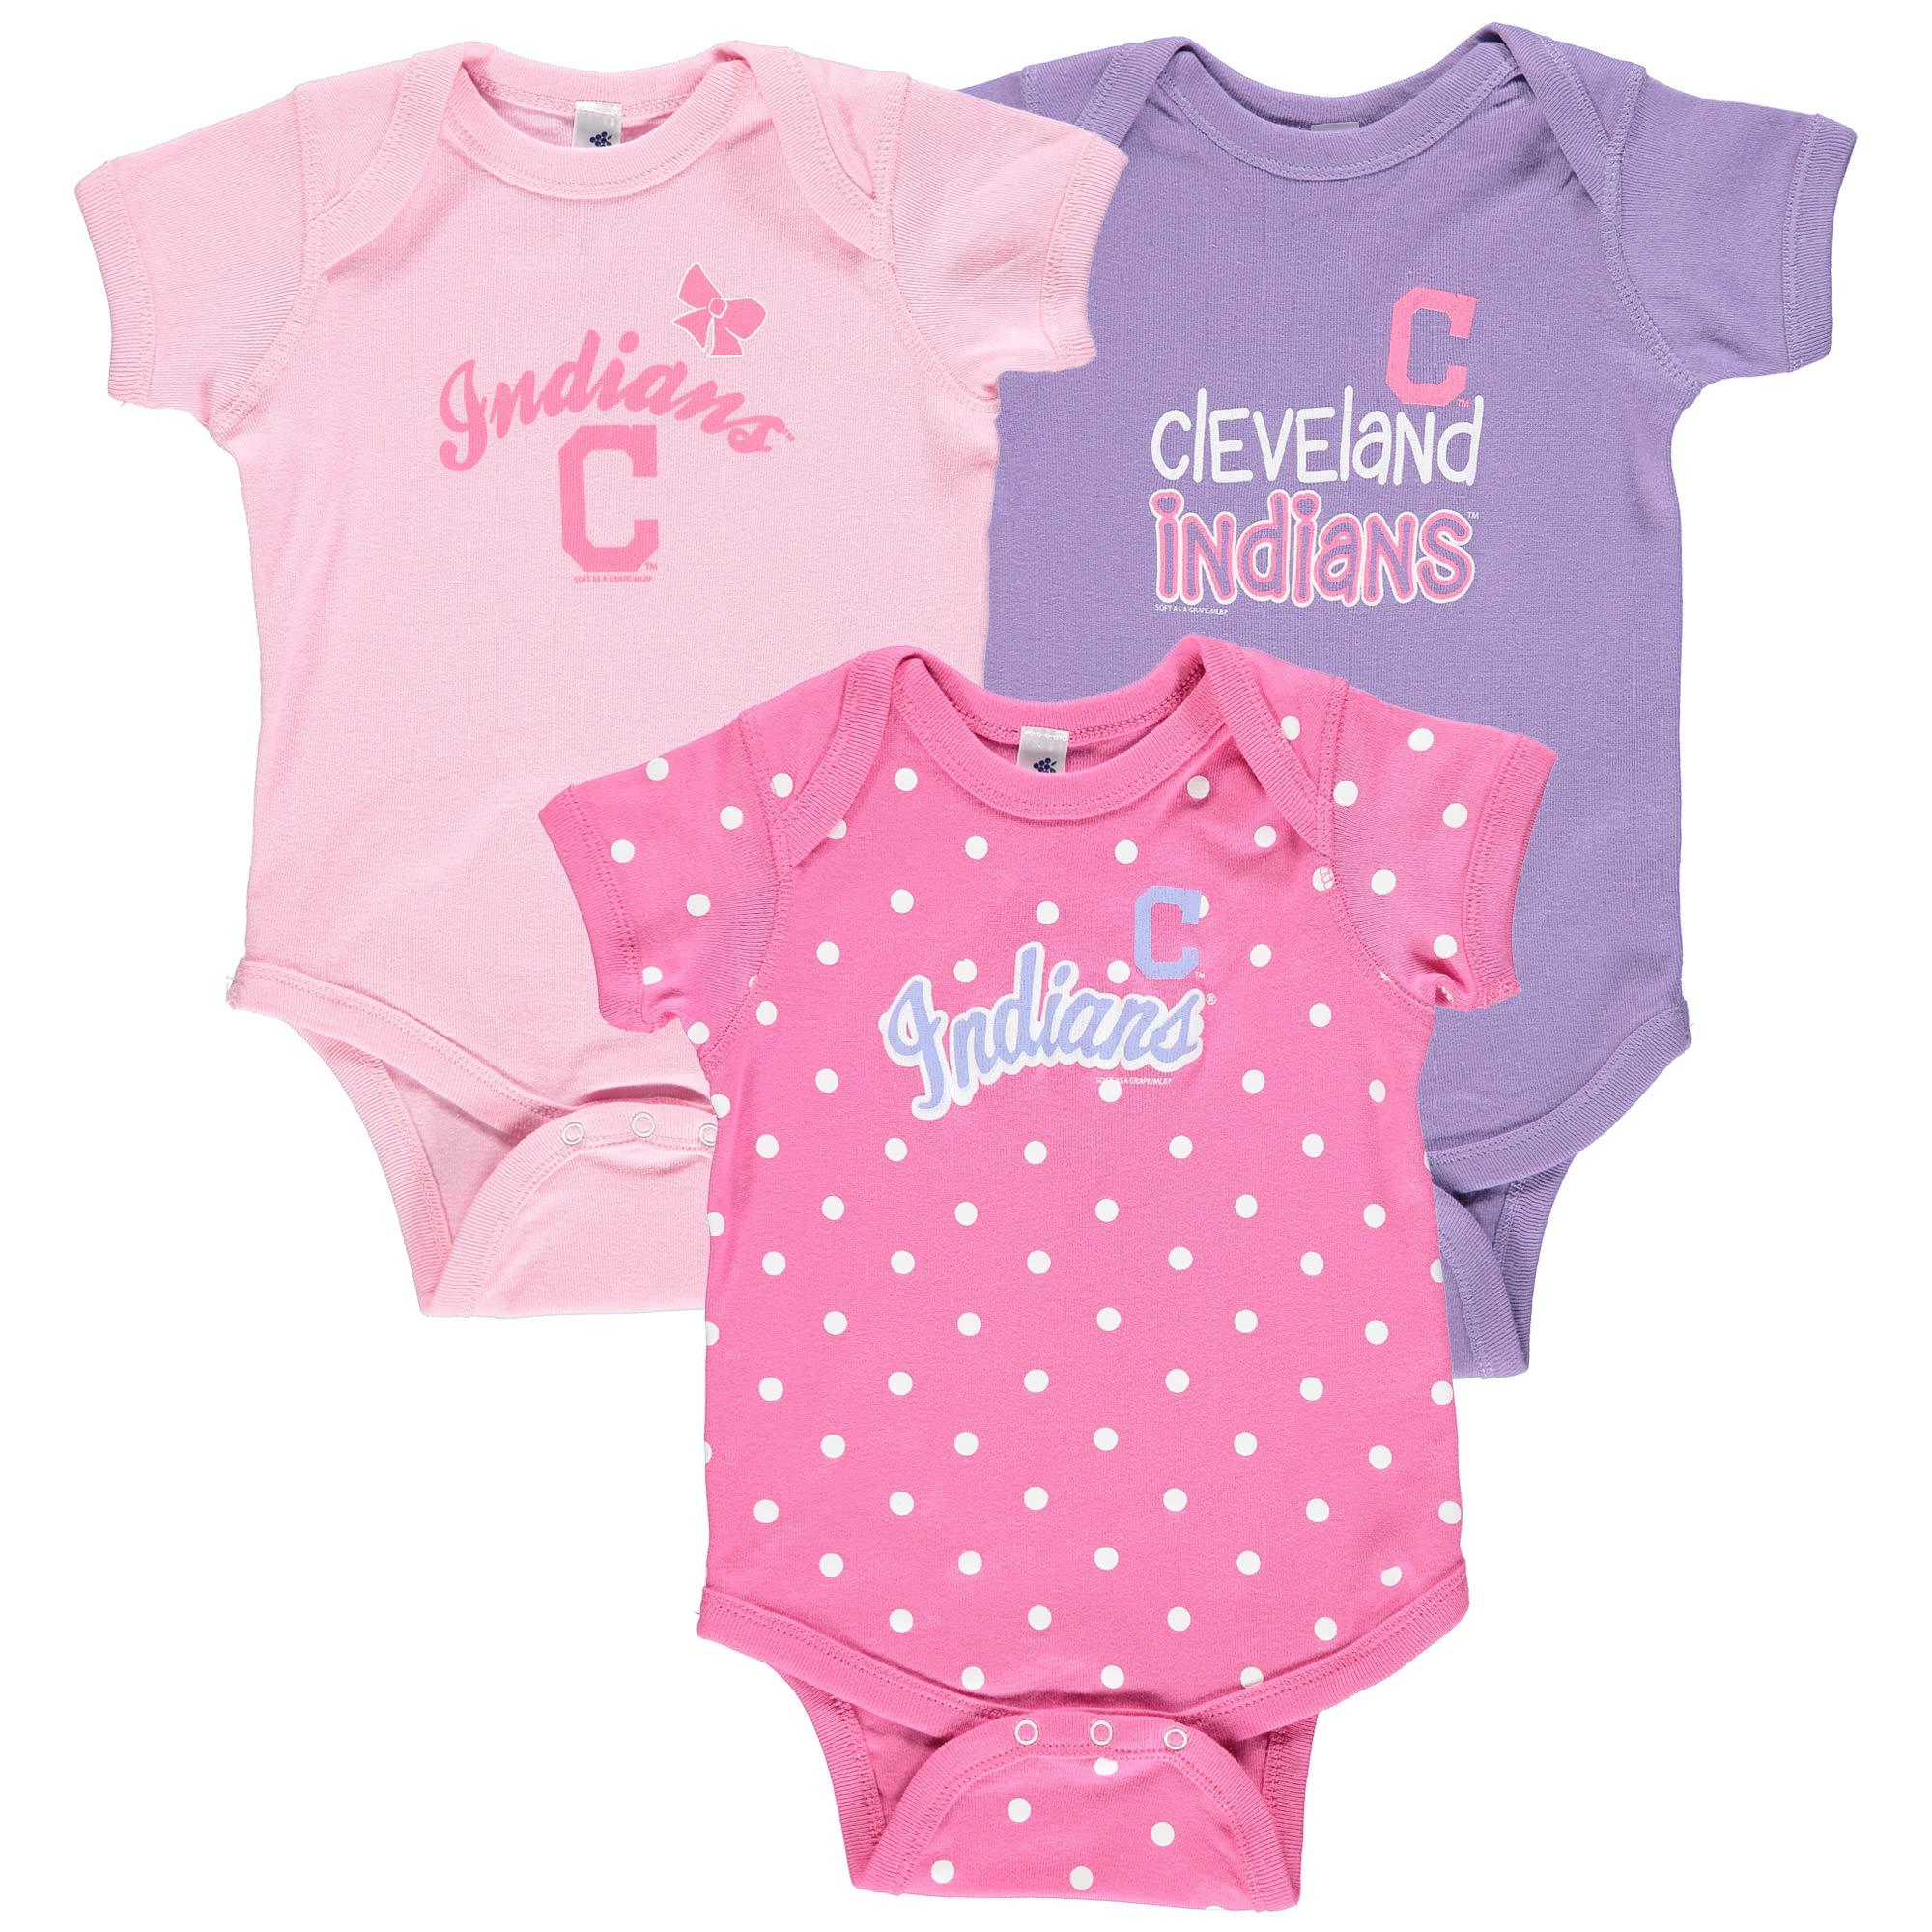 Cleveland Indians Soft as a Grape Girls Infant 3-Pack Rookie Bodysuit Set - Pink/Purple